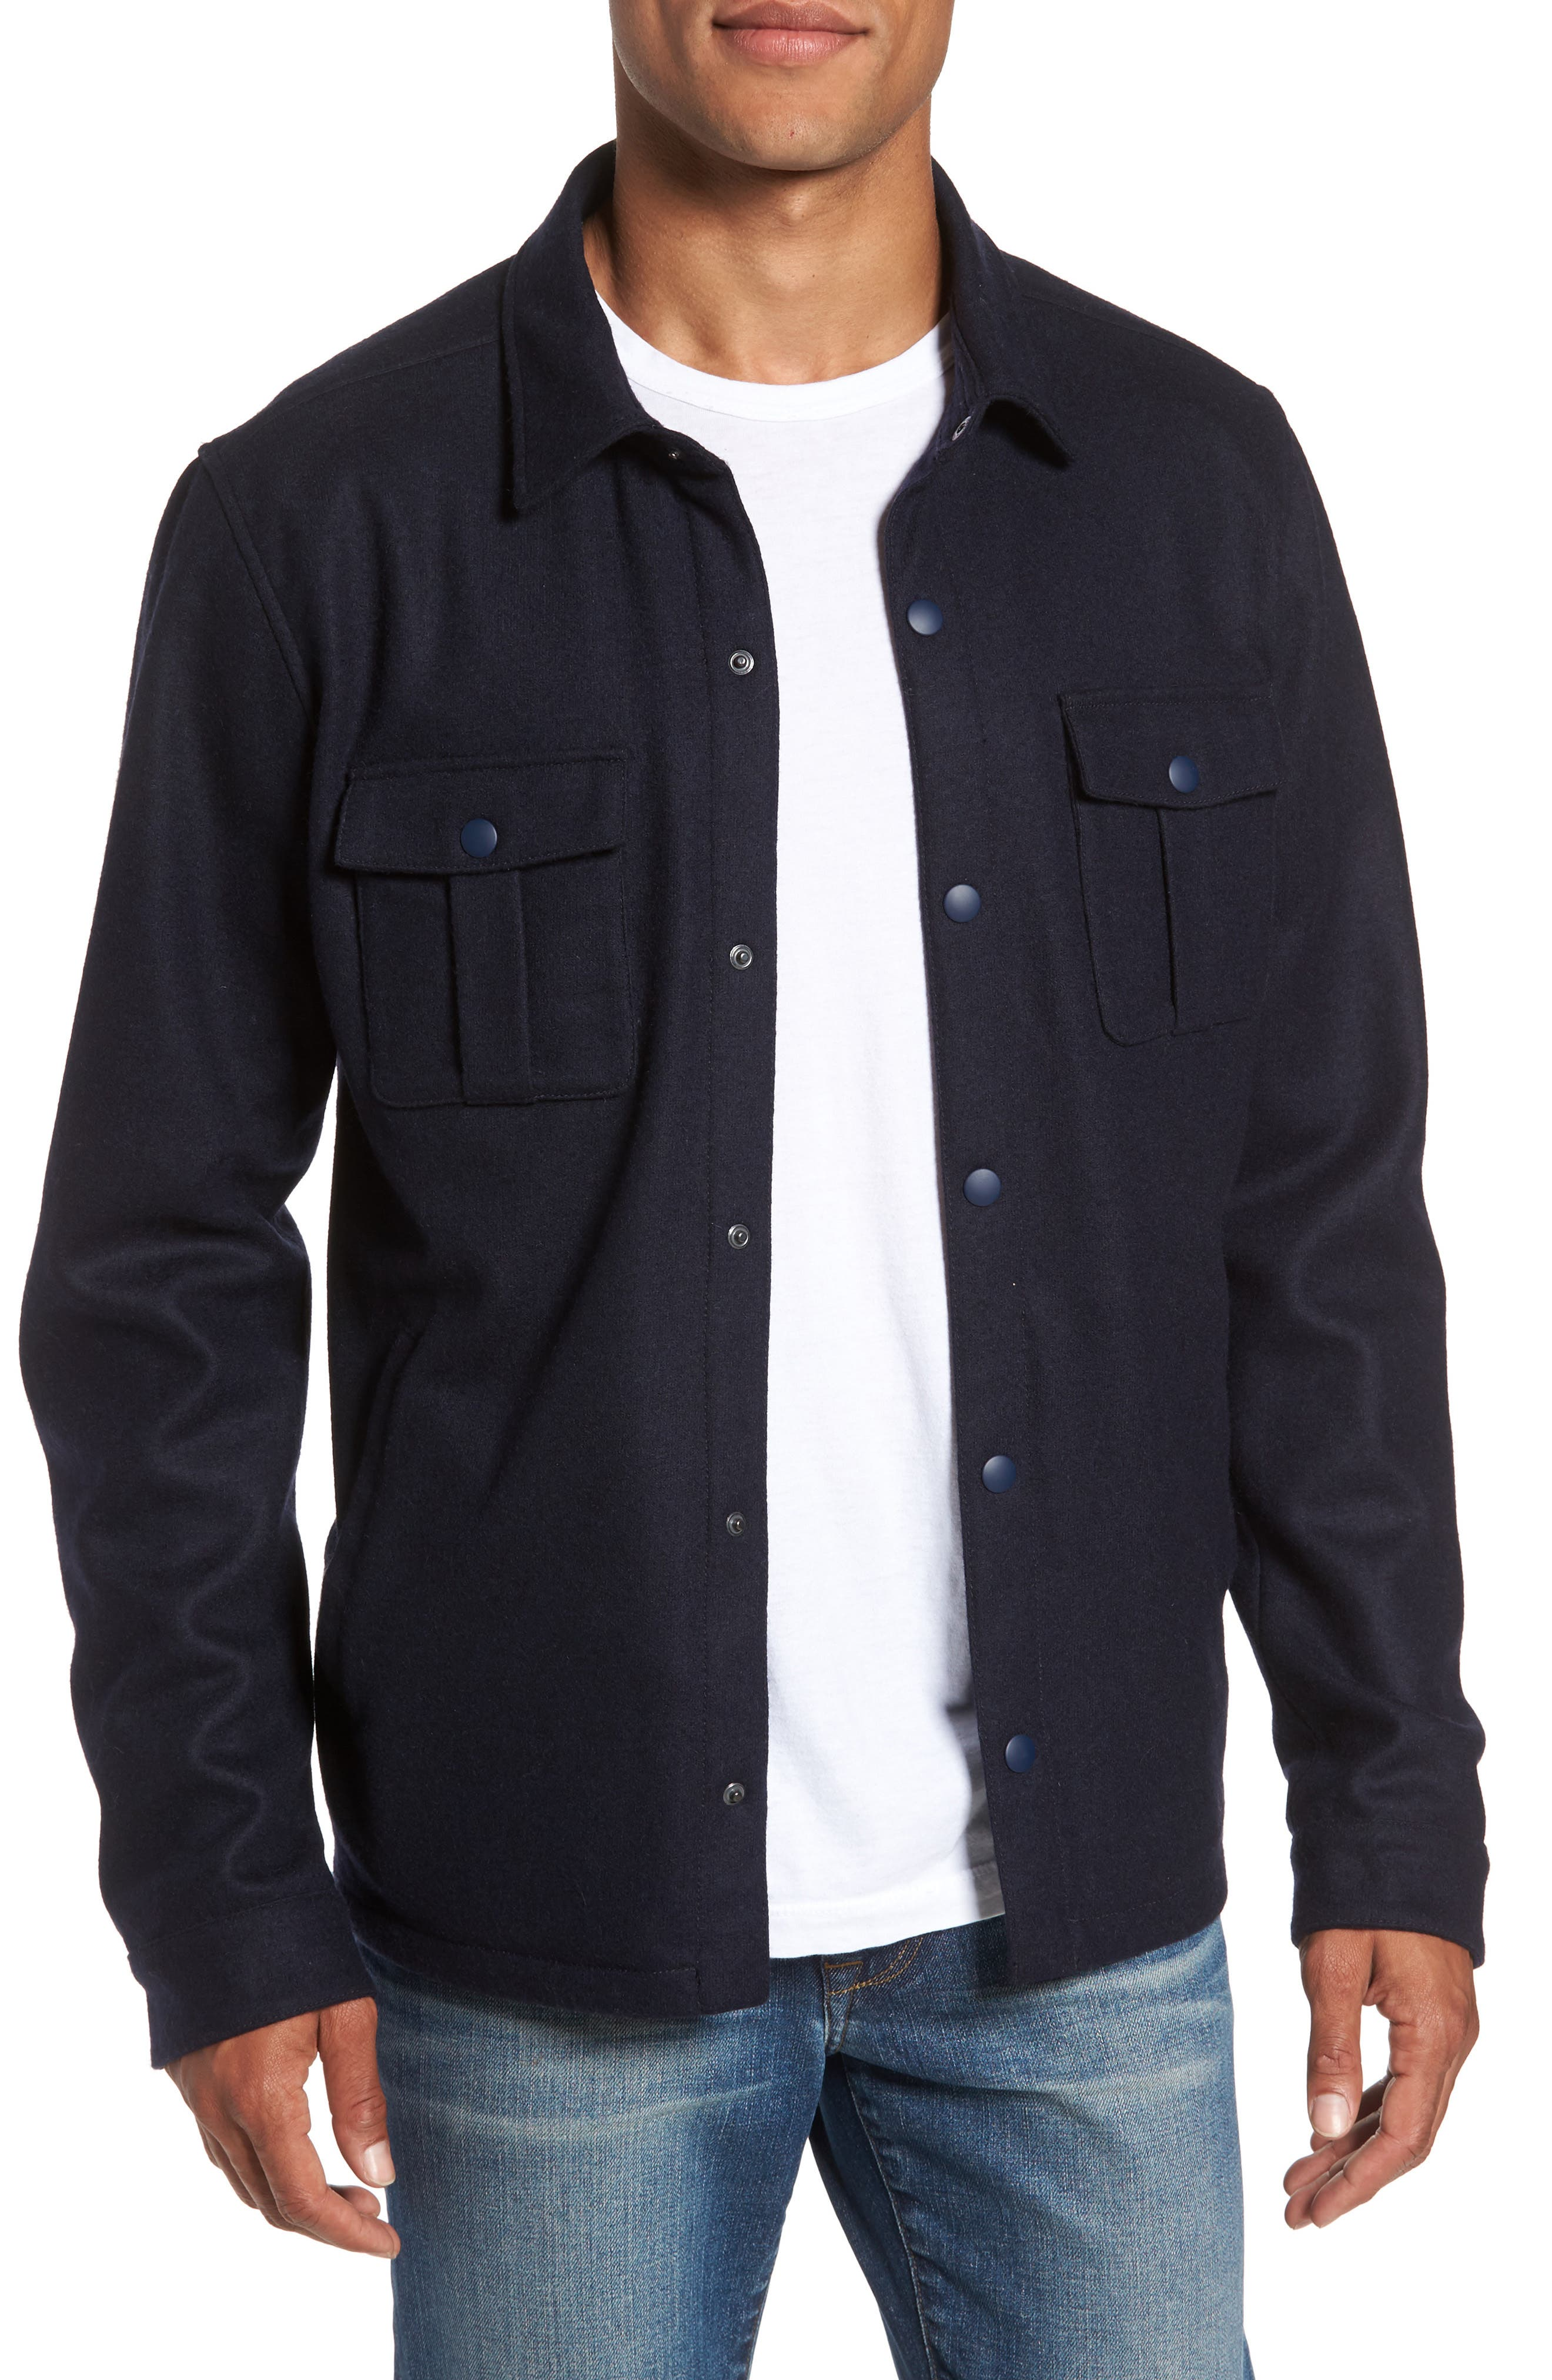 Alternate Image 1 Selected - Zachary Prell Seymour Shirt Jacket